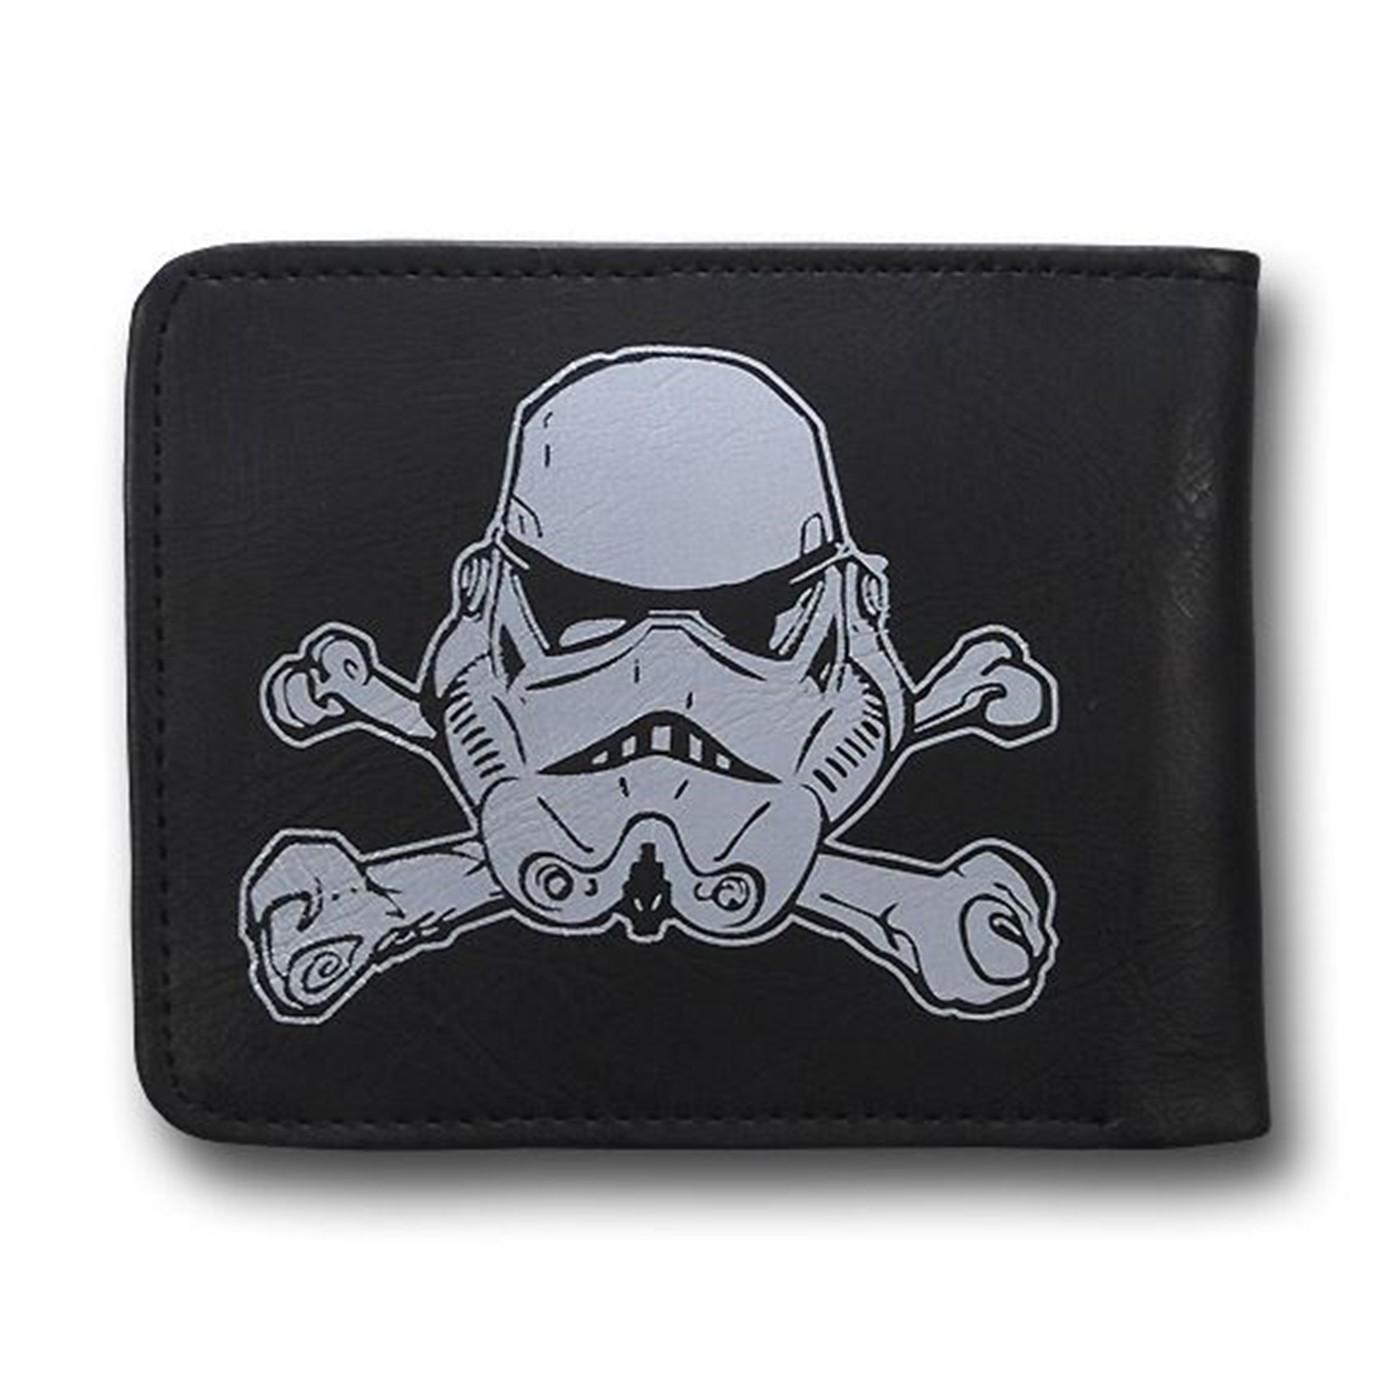 Star Wars Stormtrooper Crossbones PVC Wallet